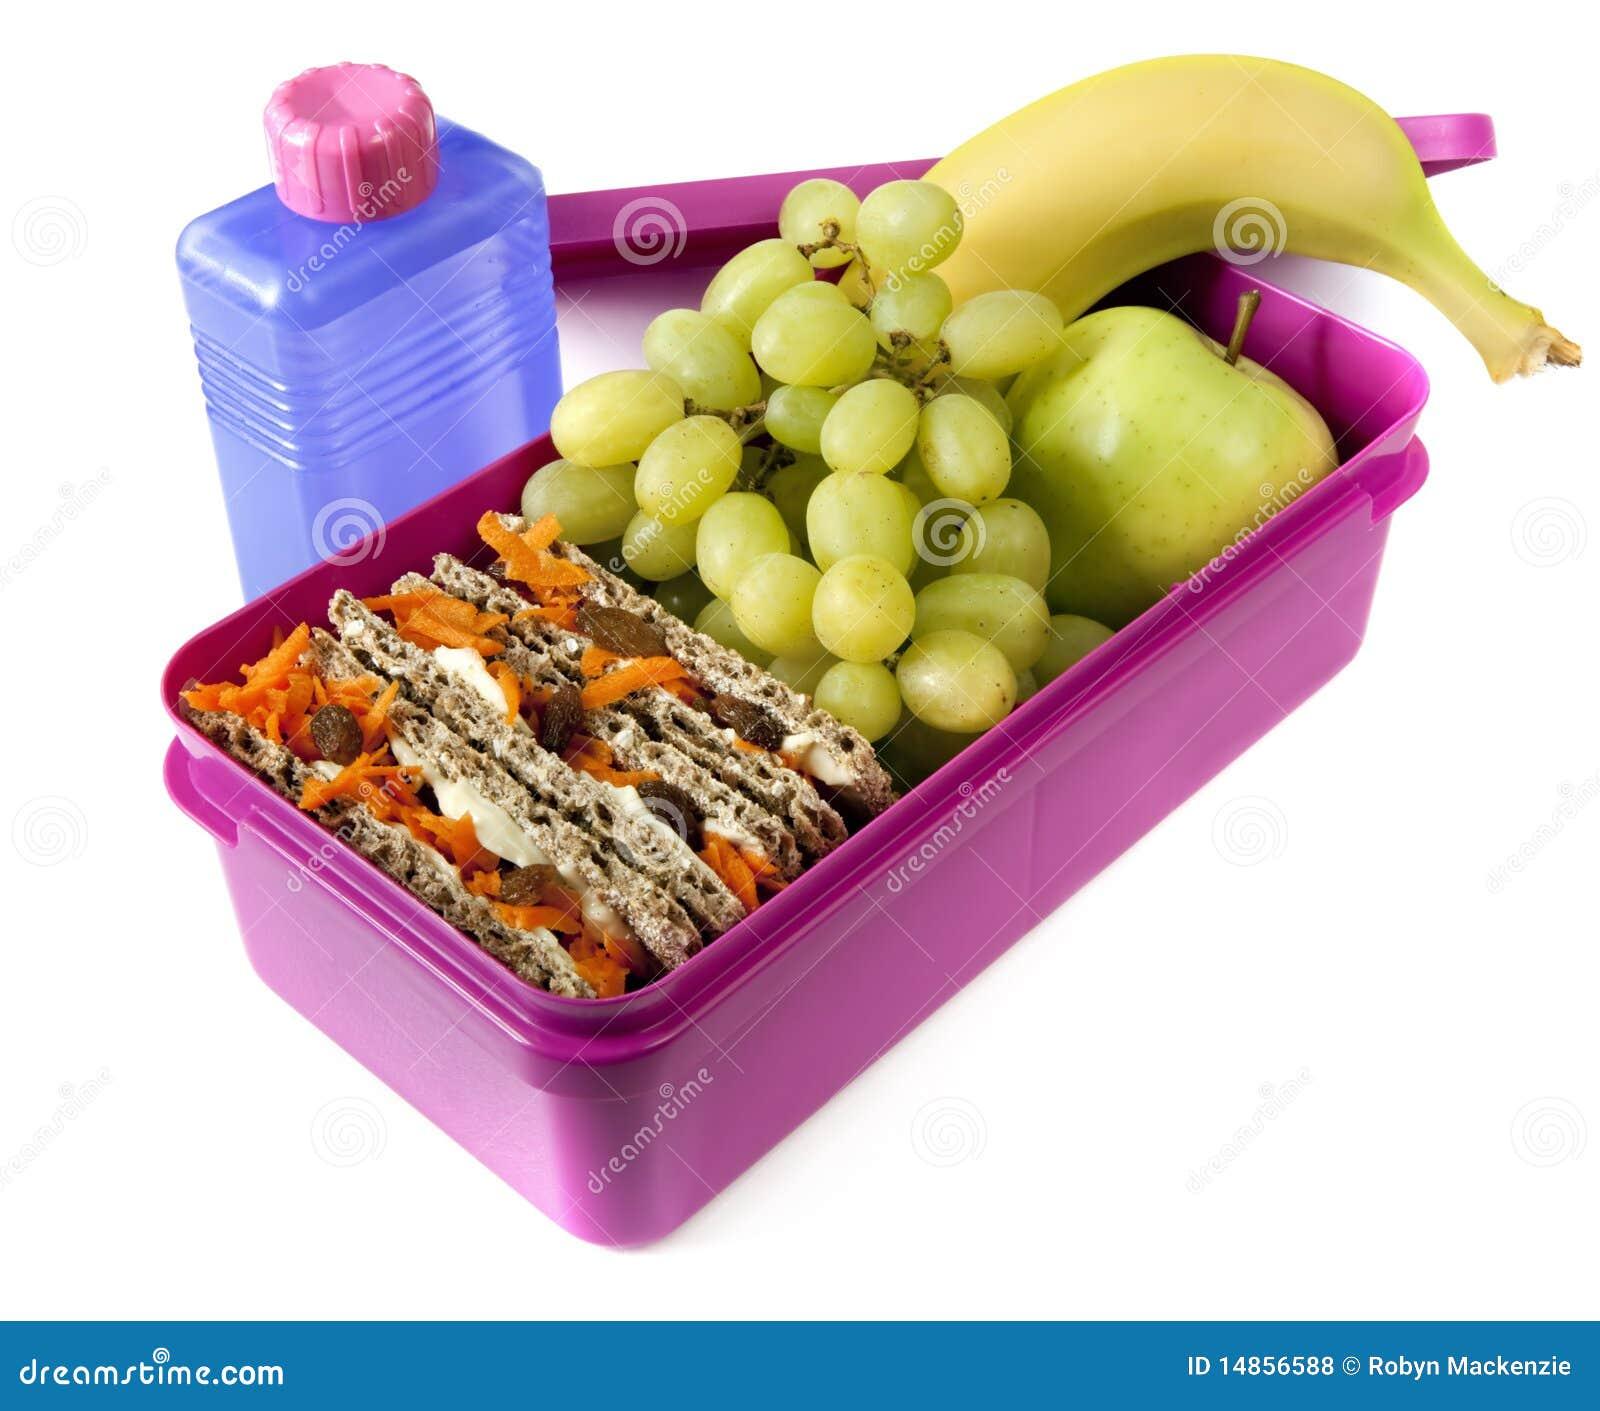 Nutritious Lunch Box